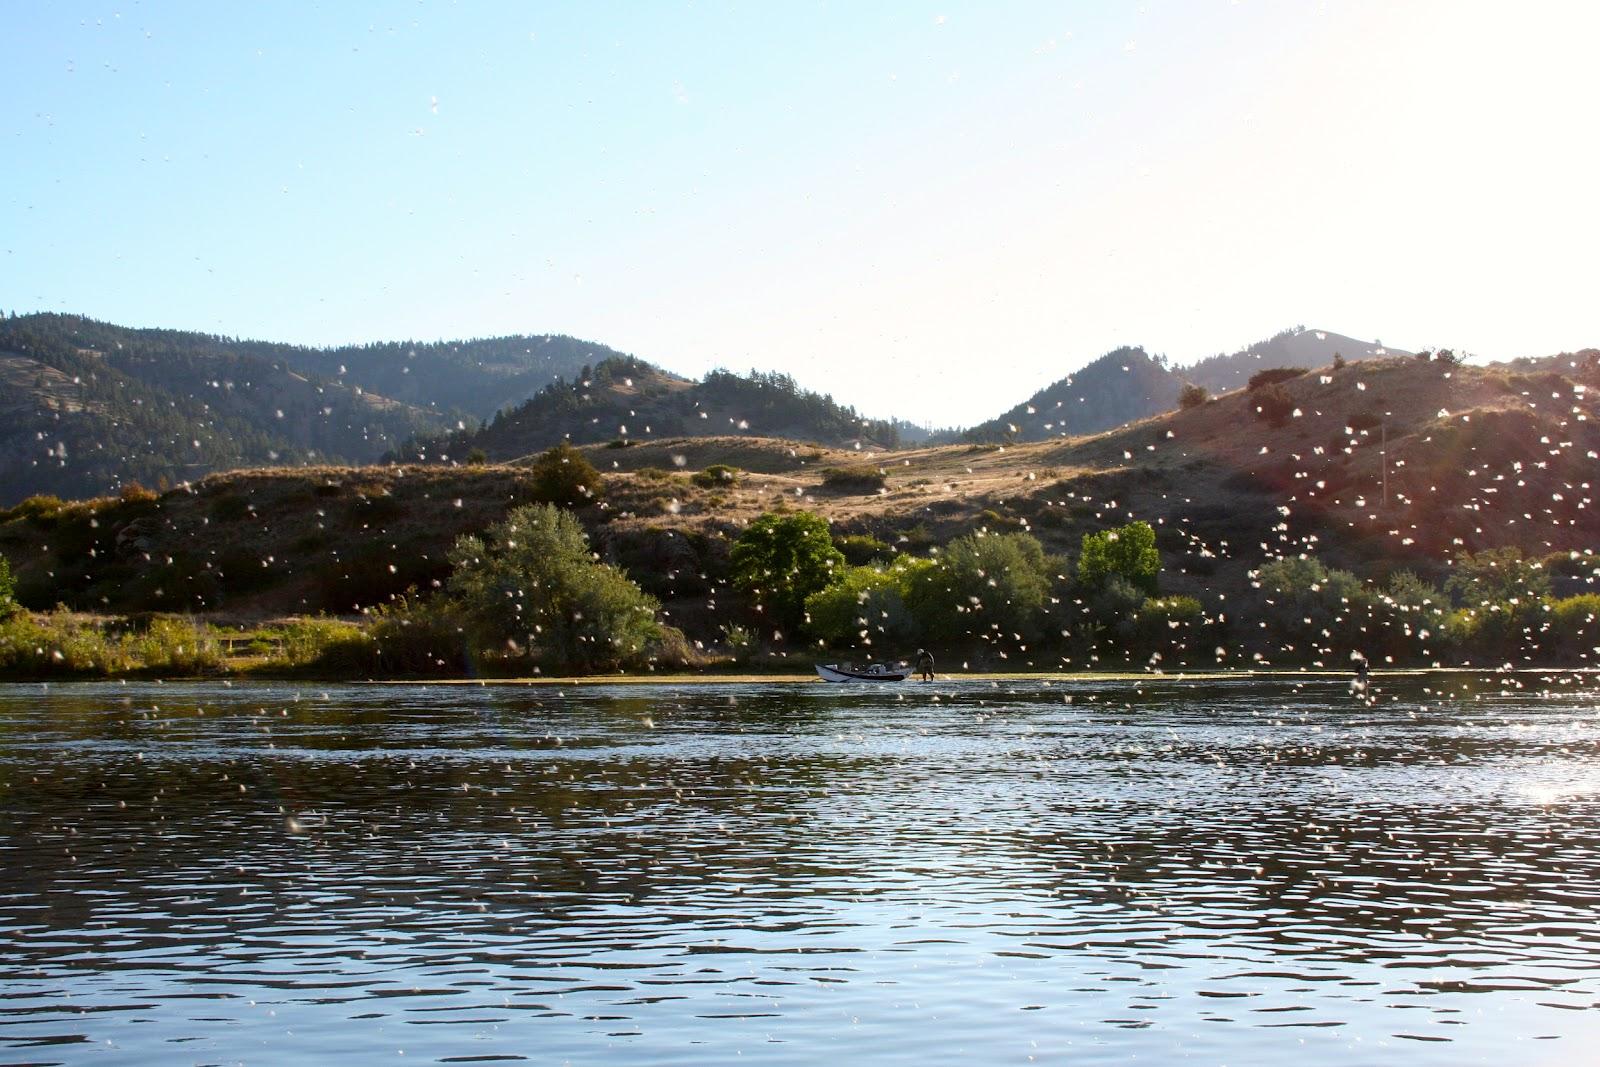 Whats next missouri river fly fishing montana for Missouri river fishing